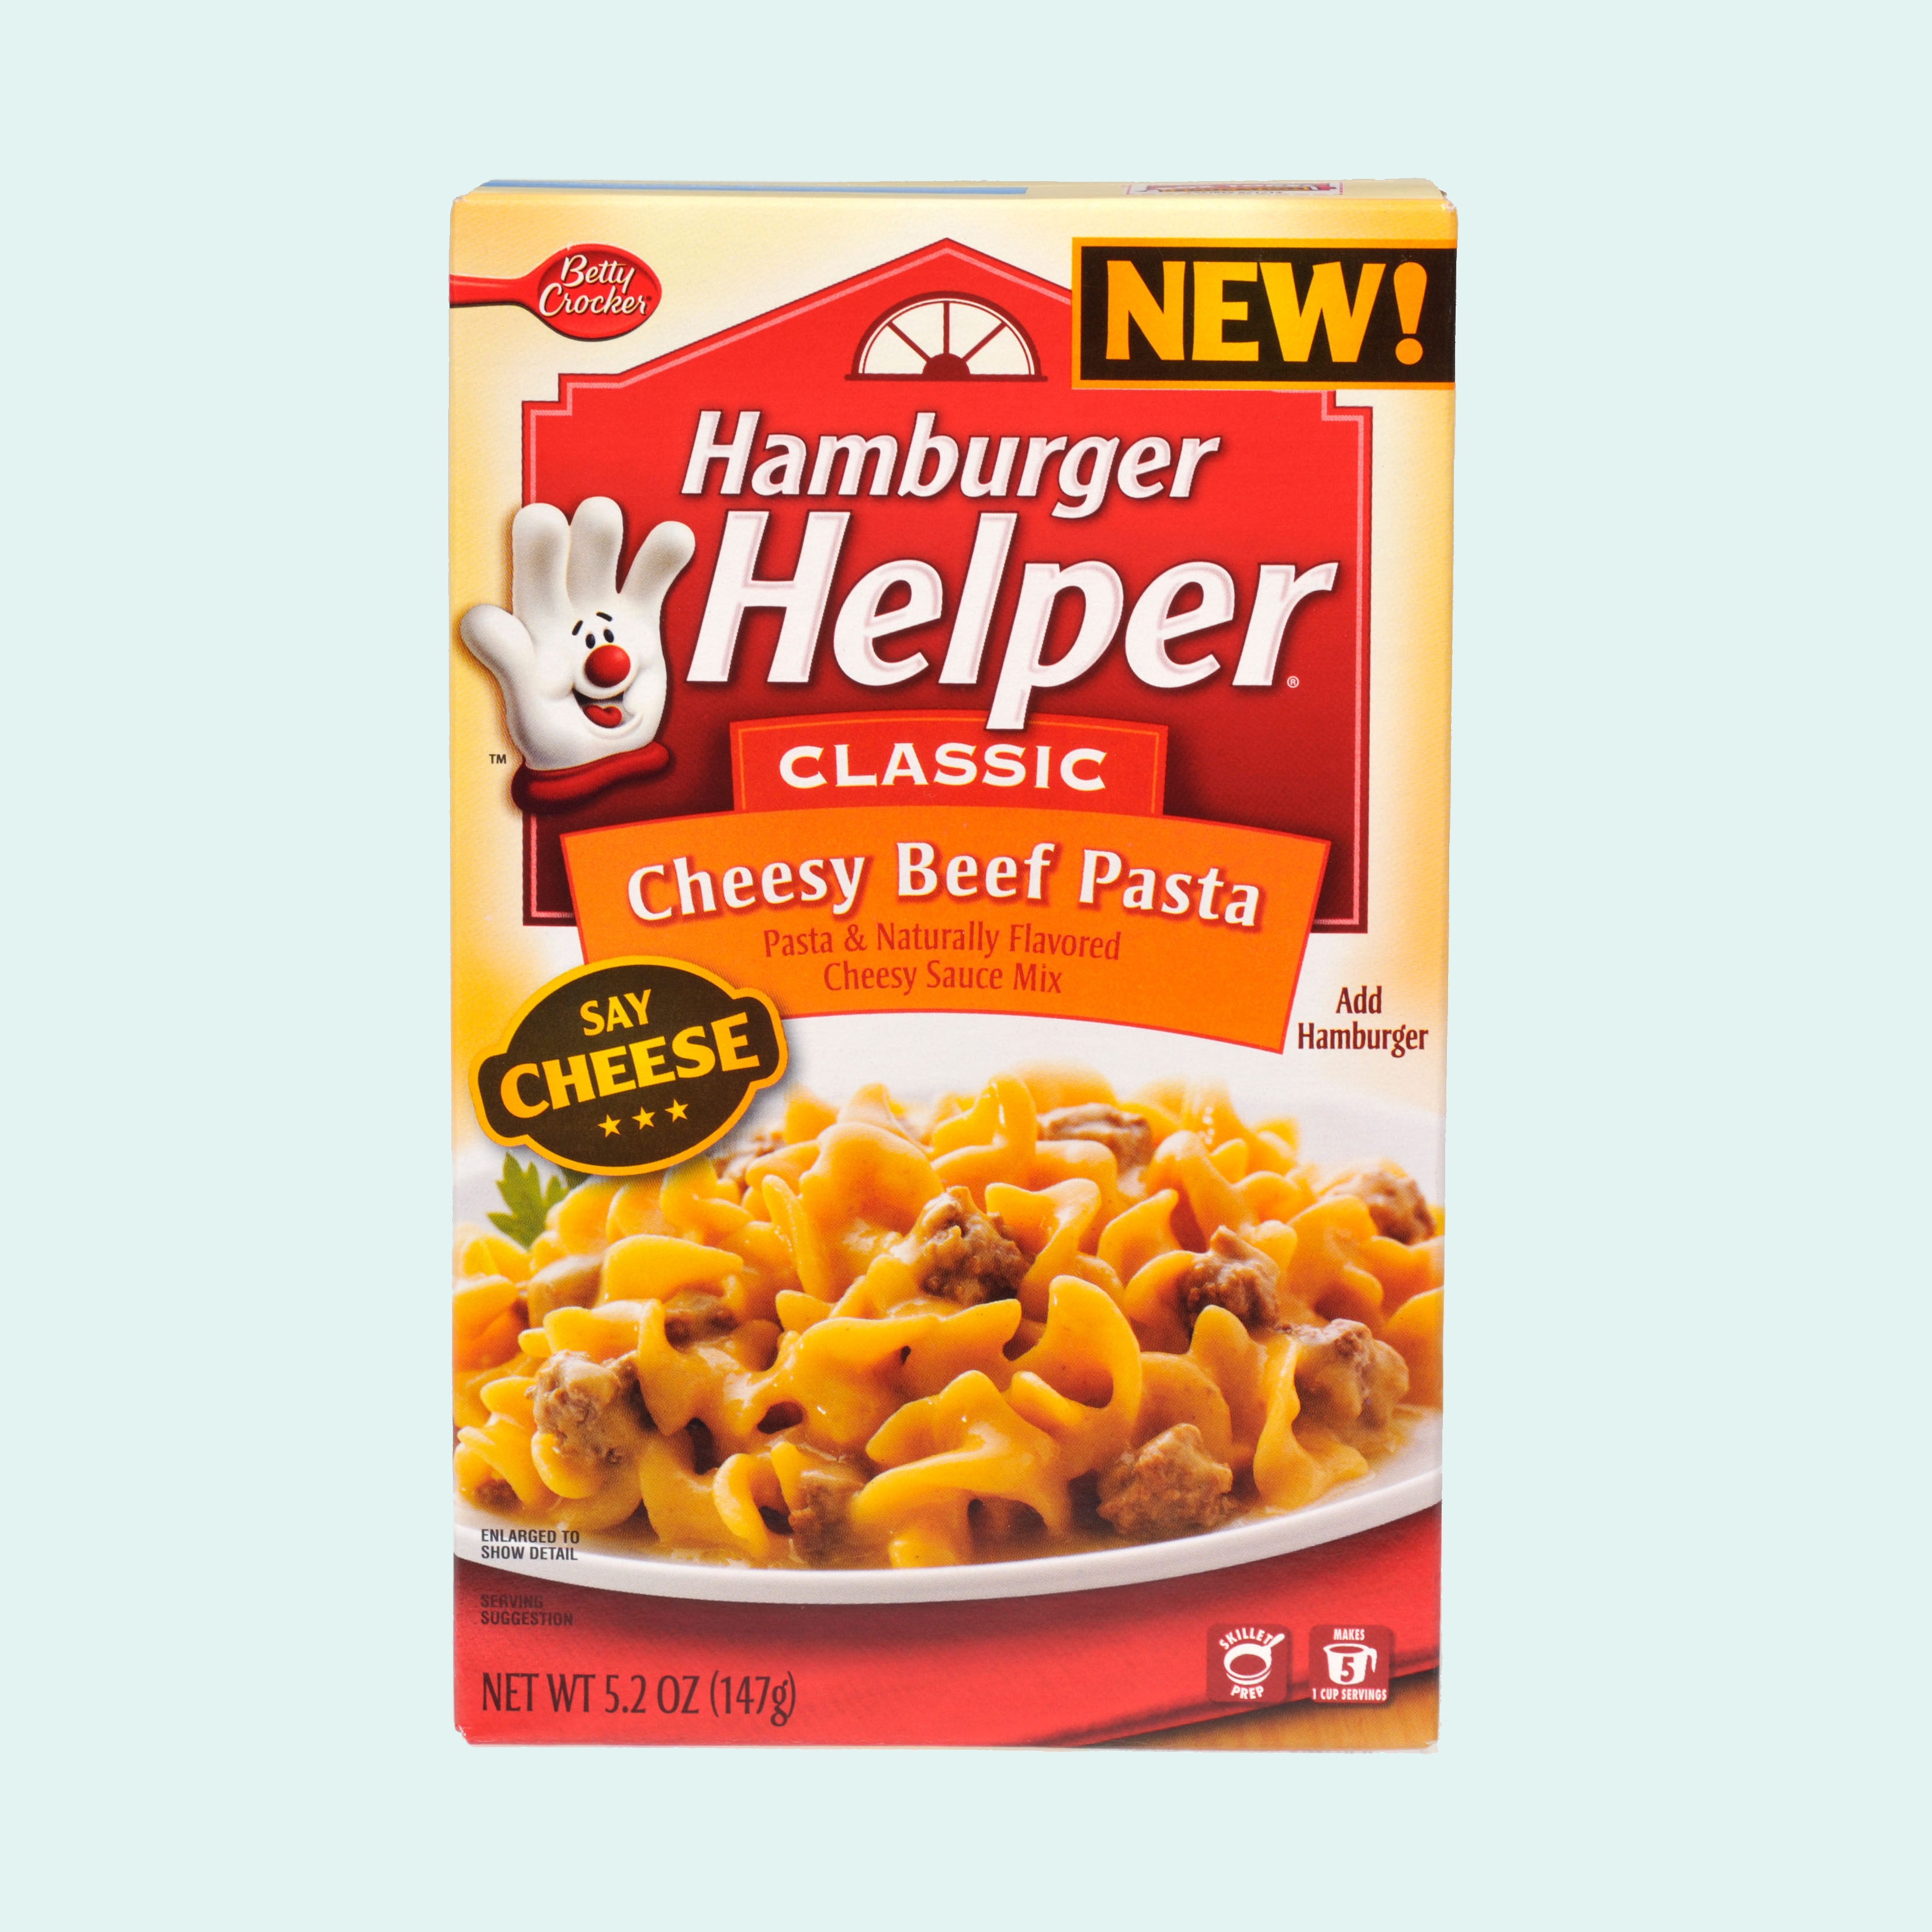 Box of Betty Crocker Cheesy Beef Pasta Hamburger Helper Classic on white background cutout.